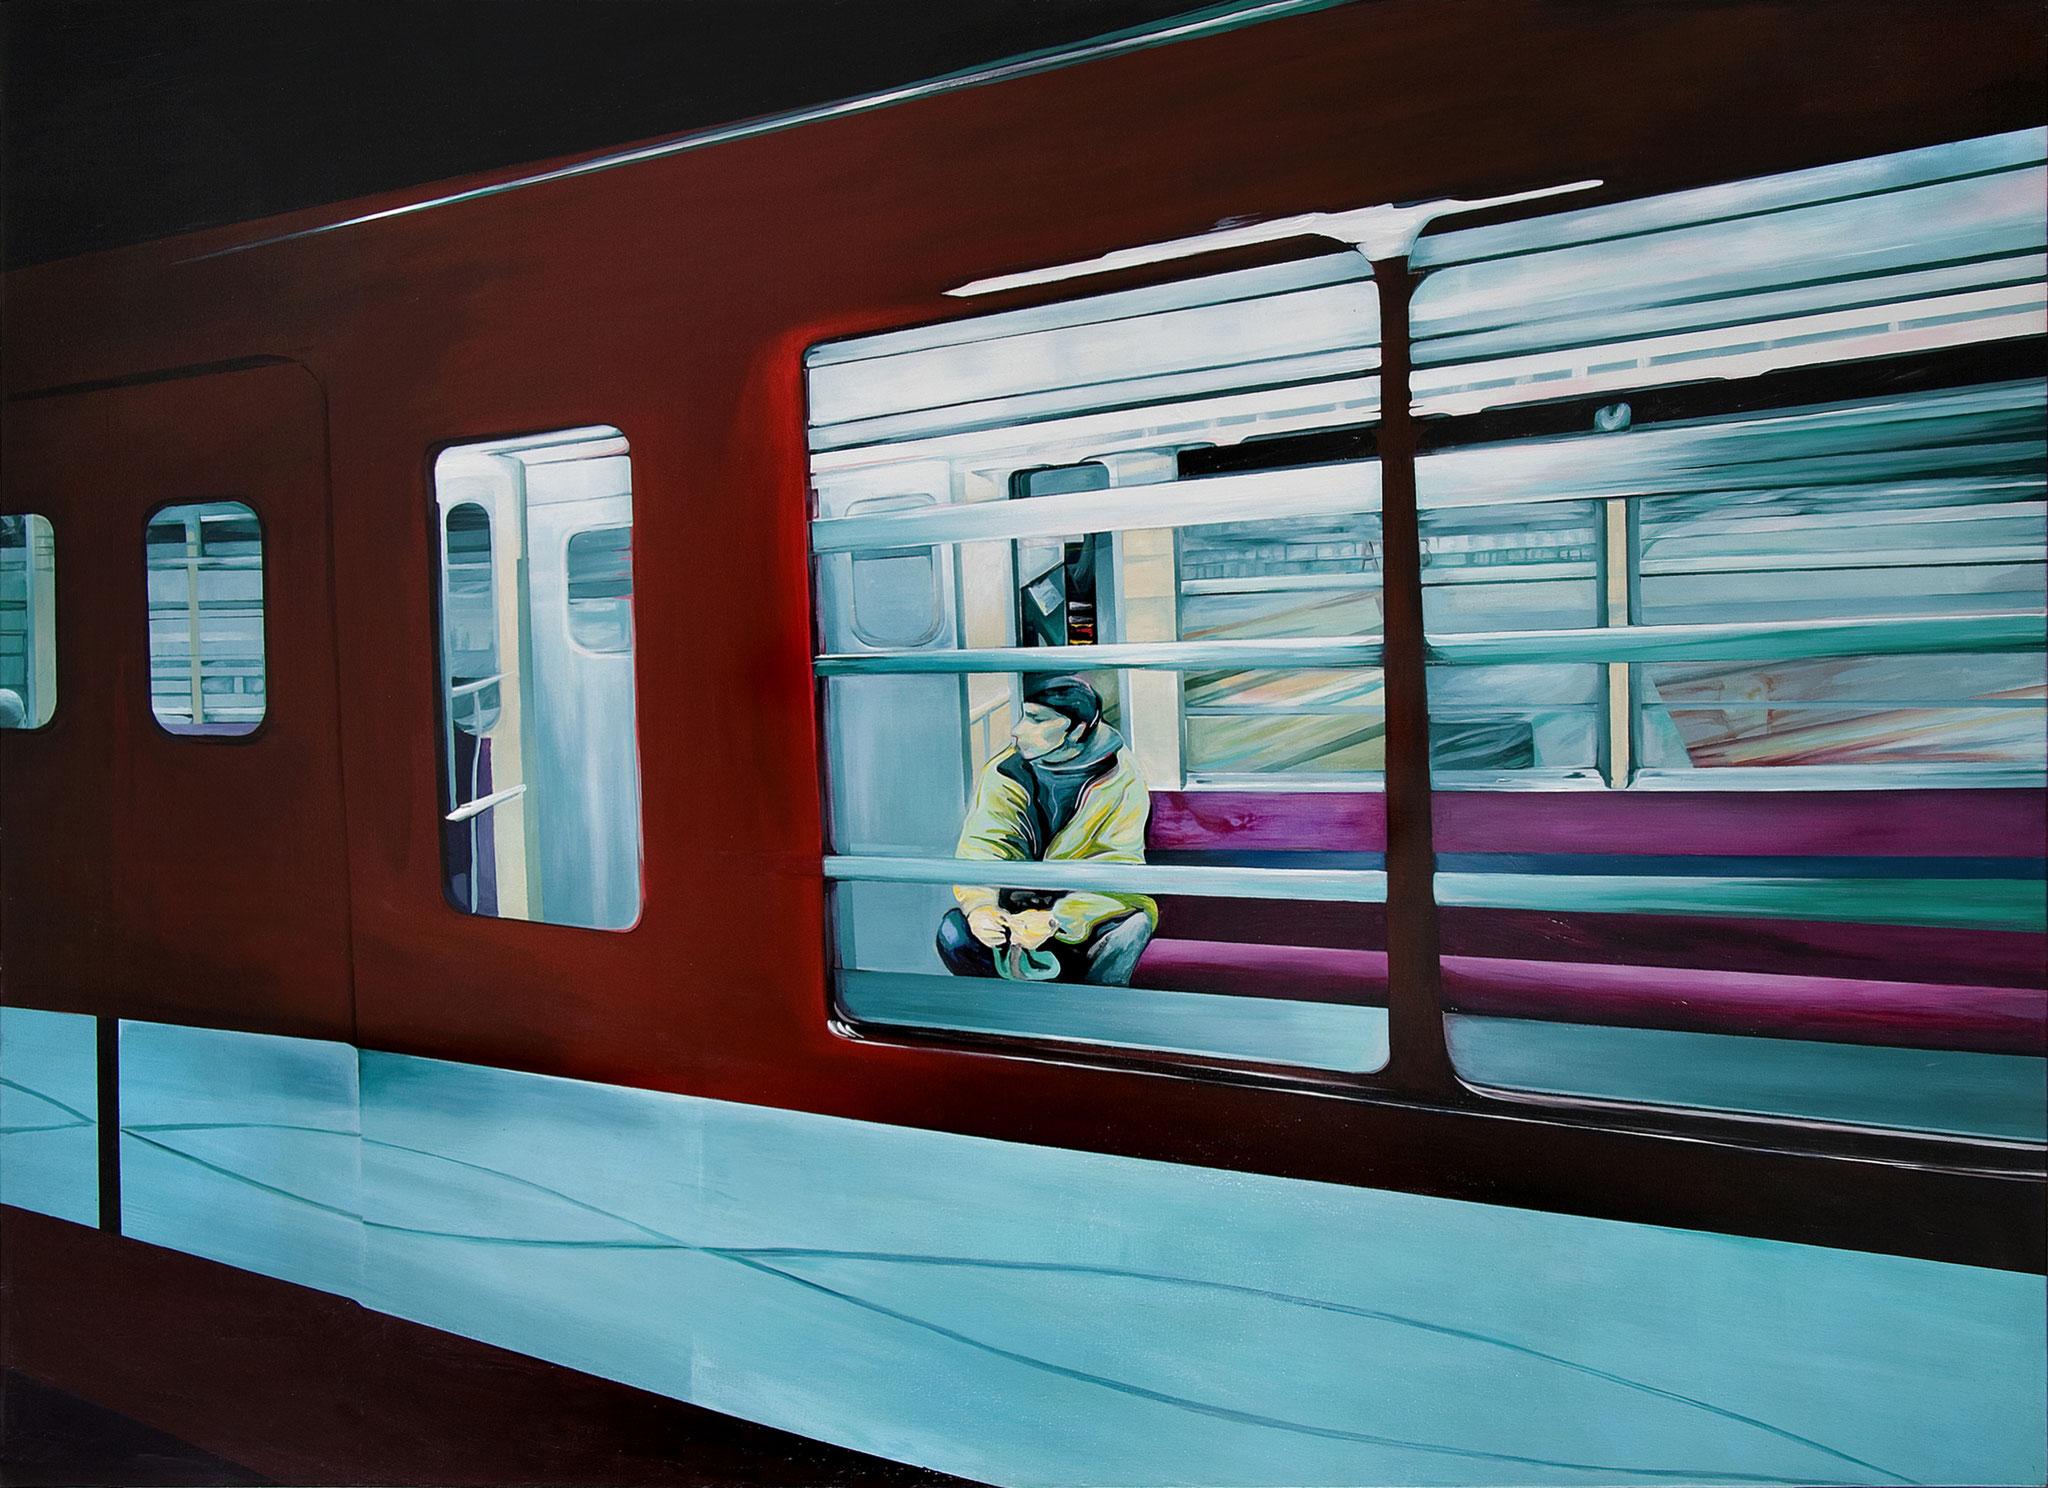 Pasajero 130 cm x 180 cm Acryl auf Leinwand 2005